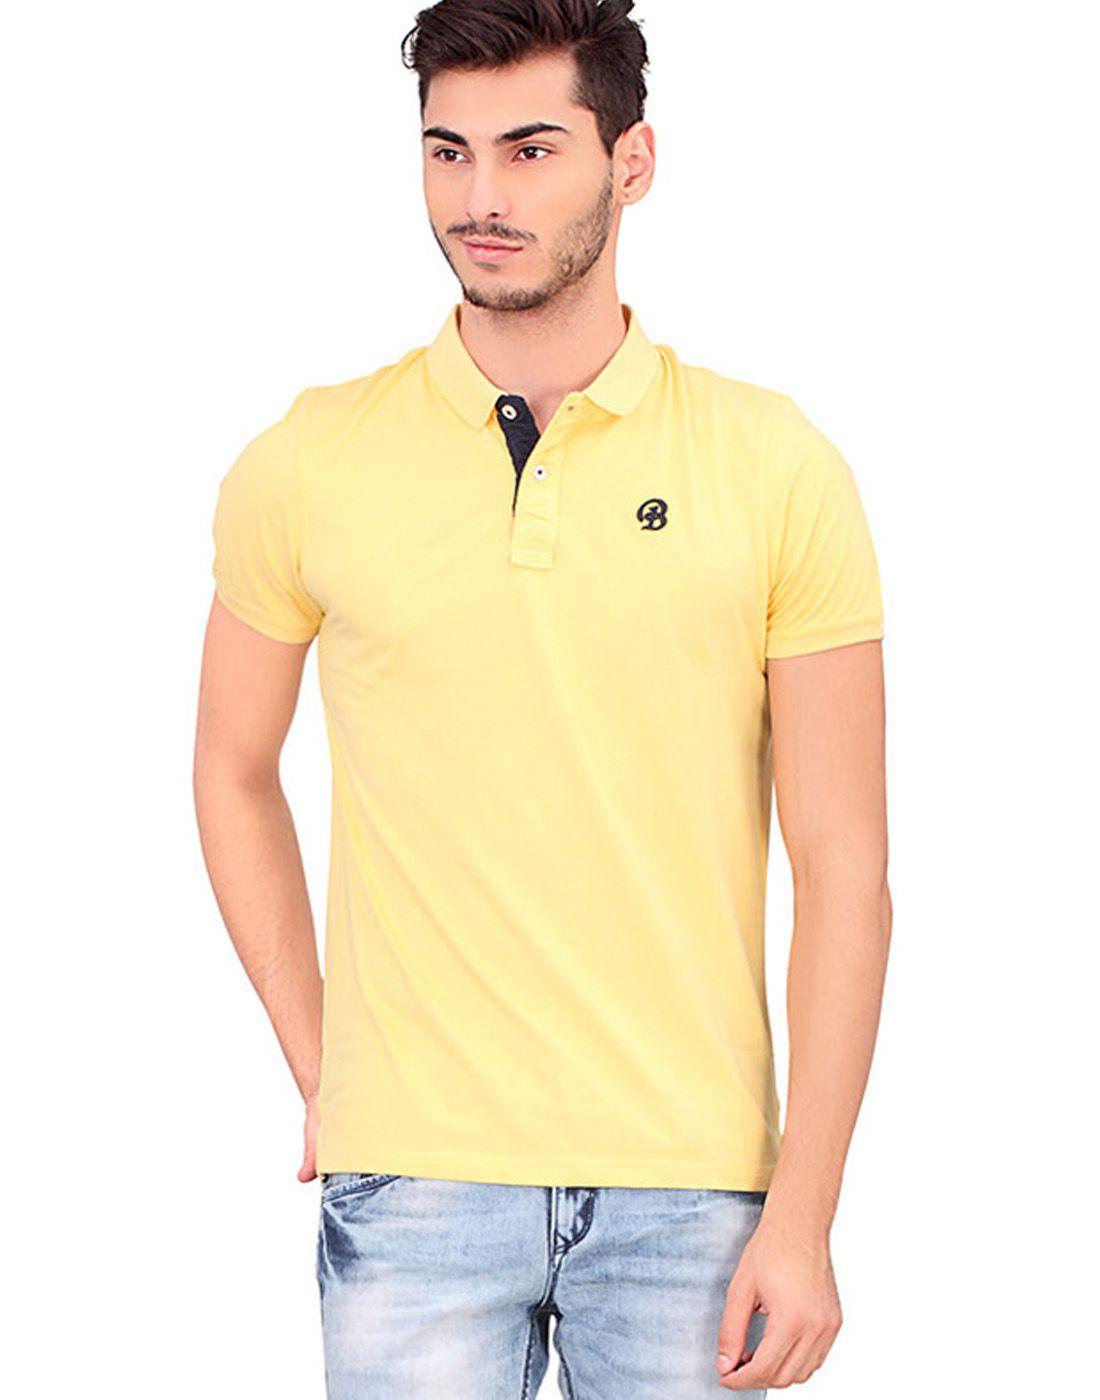 BONATY Yellow 100% Cotton Peach Finish Polo Neck Solid T-Shirt For Men